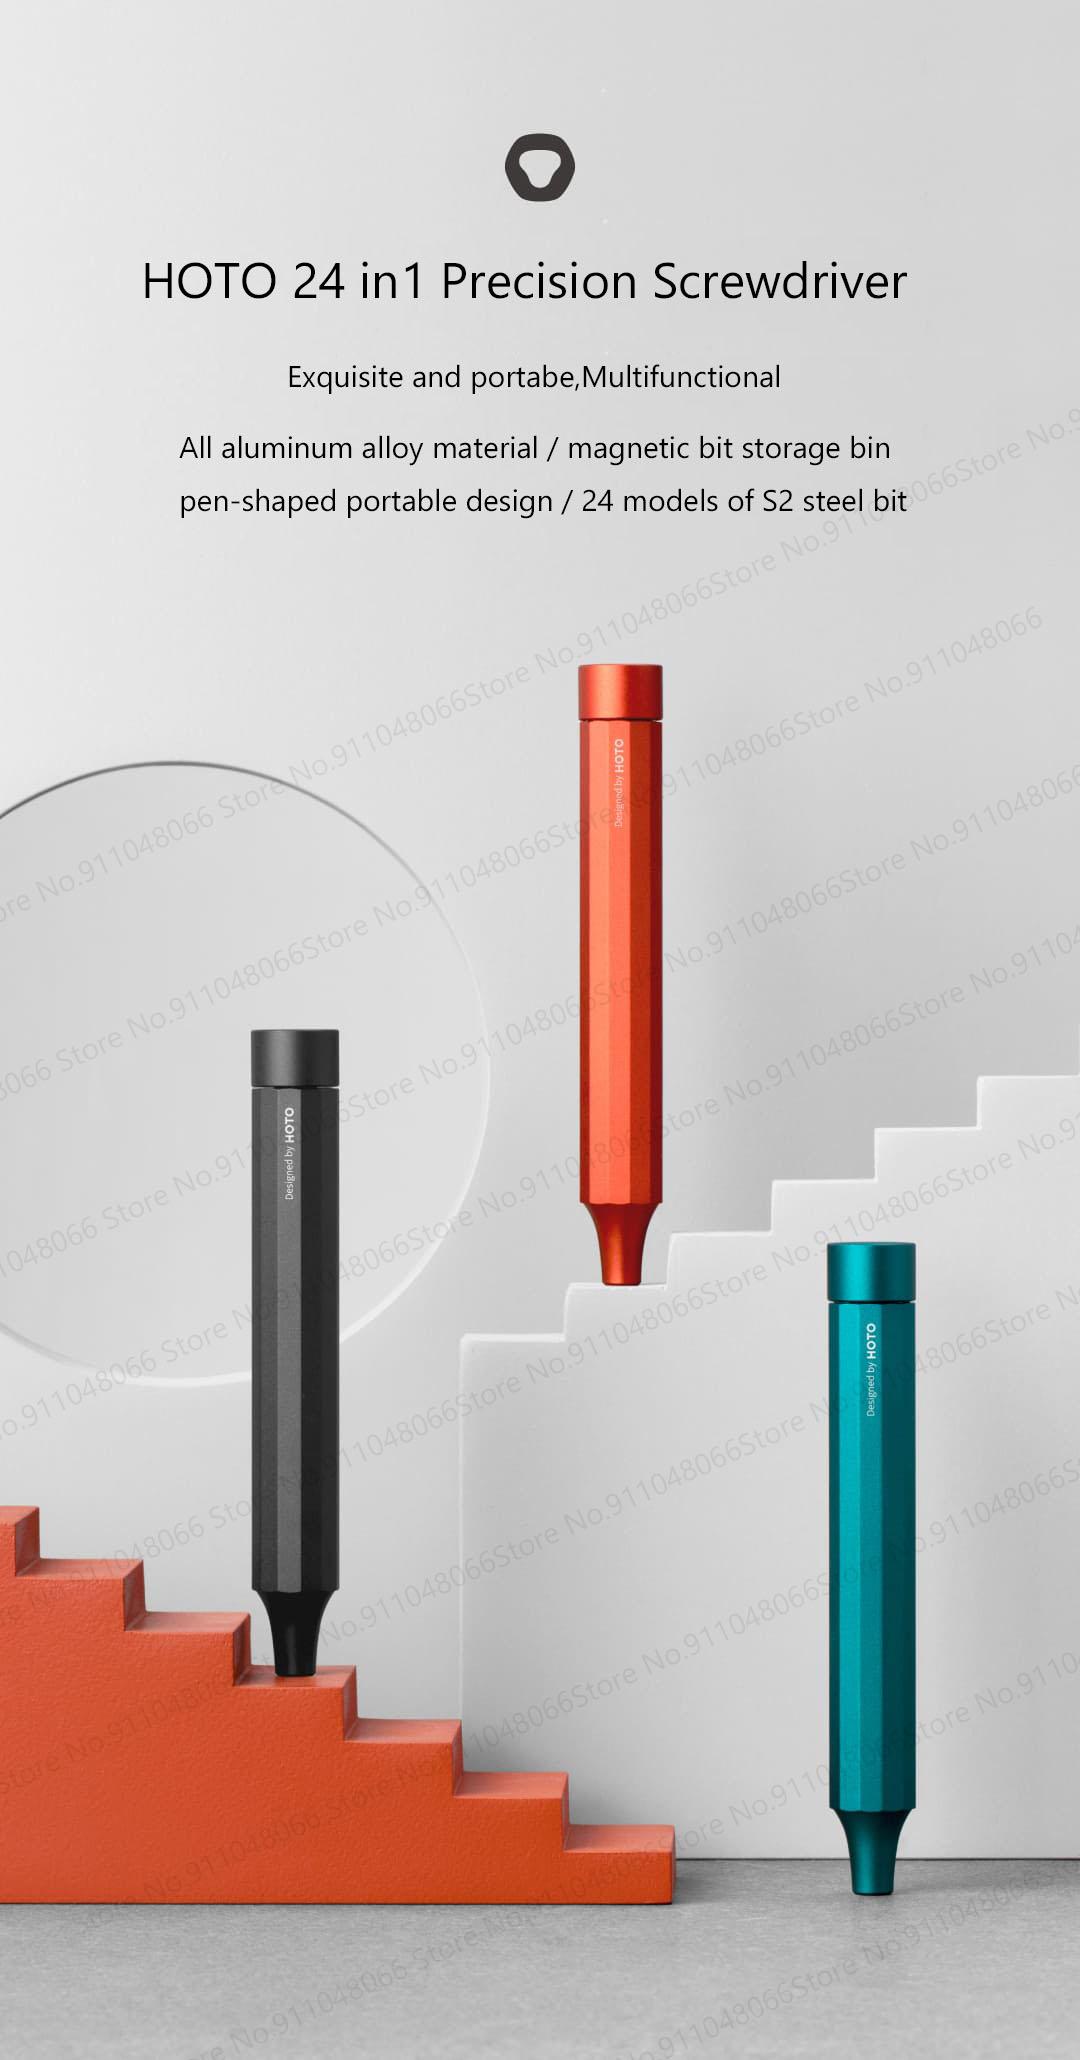 Pen Shape Screwdriver Dark Turquoise HOTO Screwdriver Sets 24-in-1 Mini Screwdriver Set Precision Screwdriver Set with 24 pcs Tough S2 Alloy Steel Bits